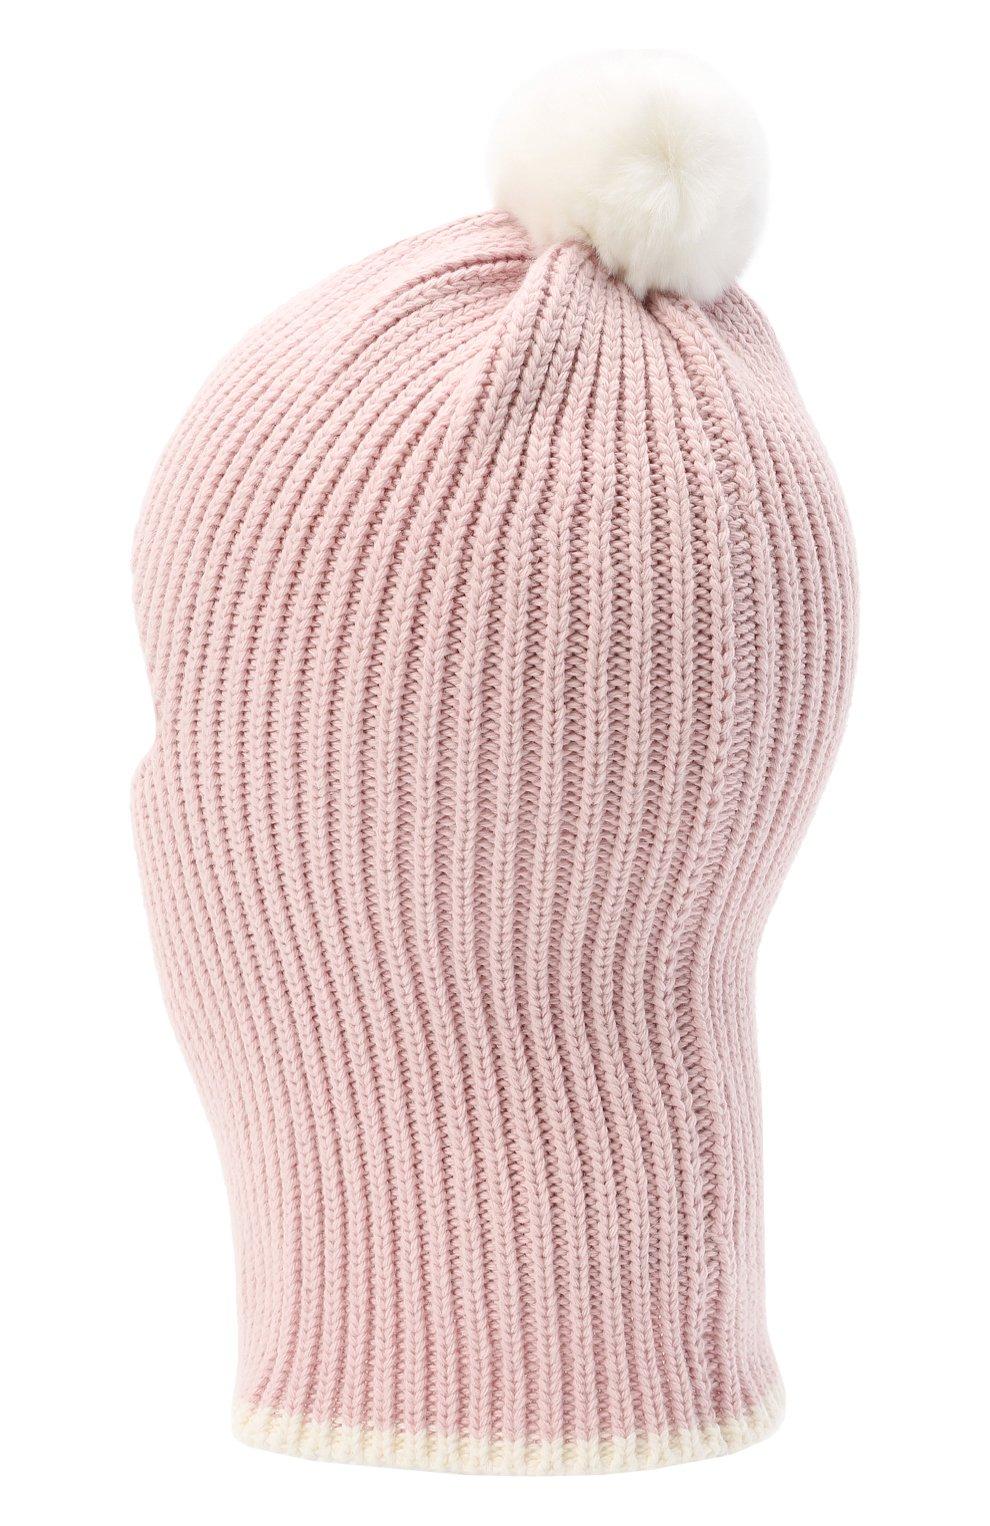 Детского хлопковая шапка-балаклава CHOBI светло-розового цвета, арт. WH-3012 | Фото 2